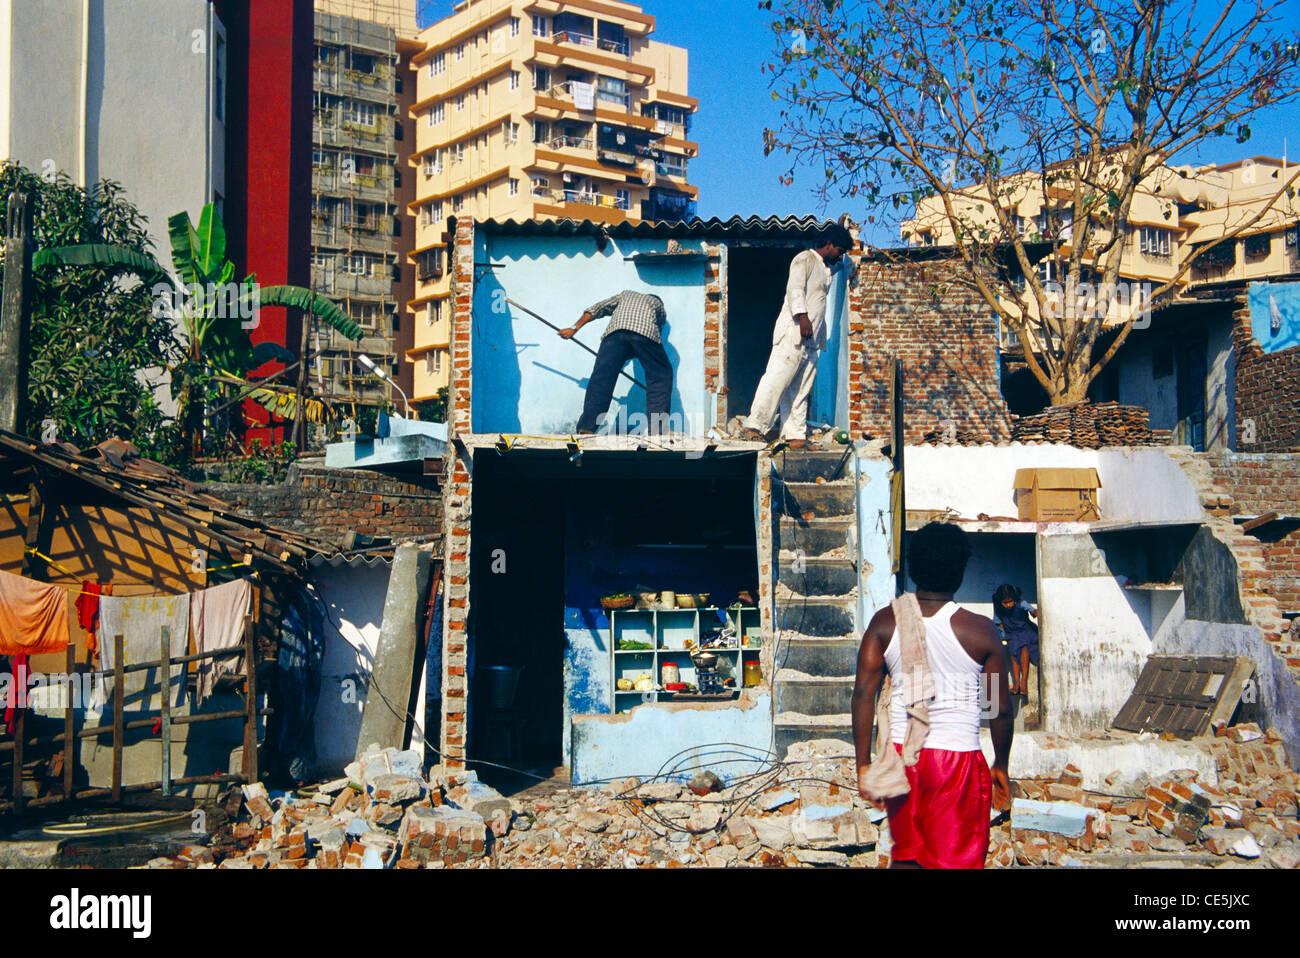 Slum house illegal demolished broken below modern buildings bombay mumbai maharashtra India - Stock Image